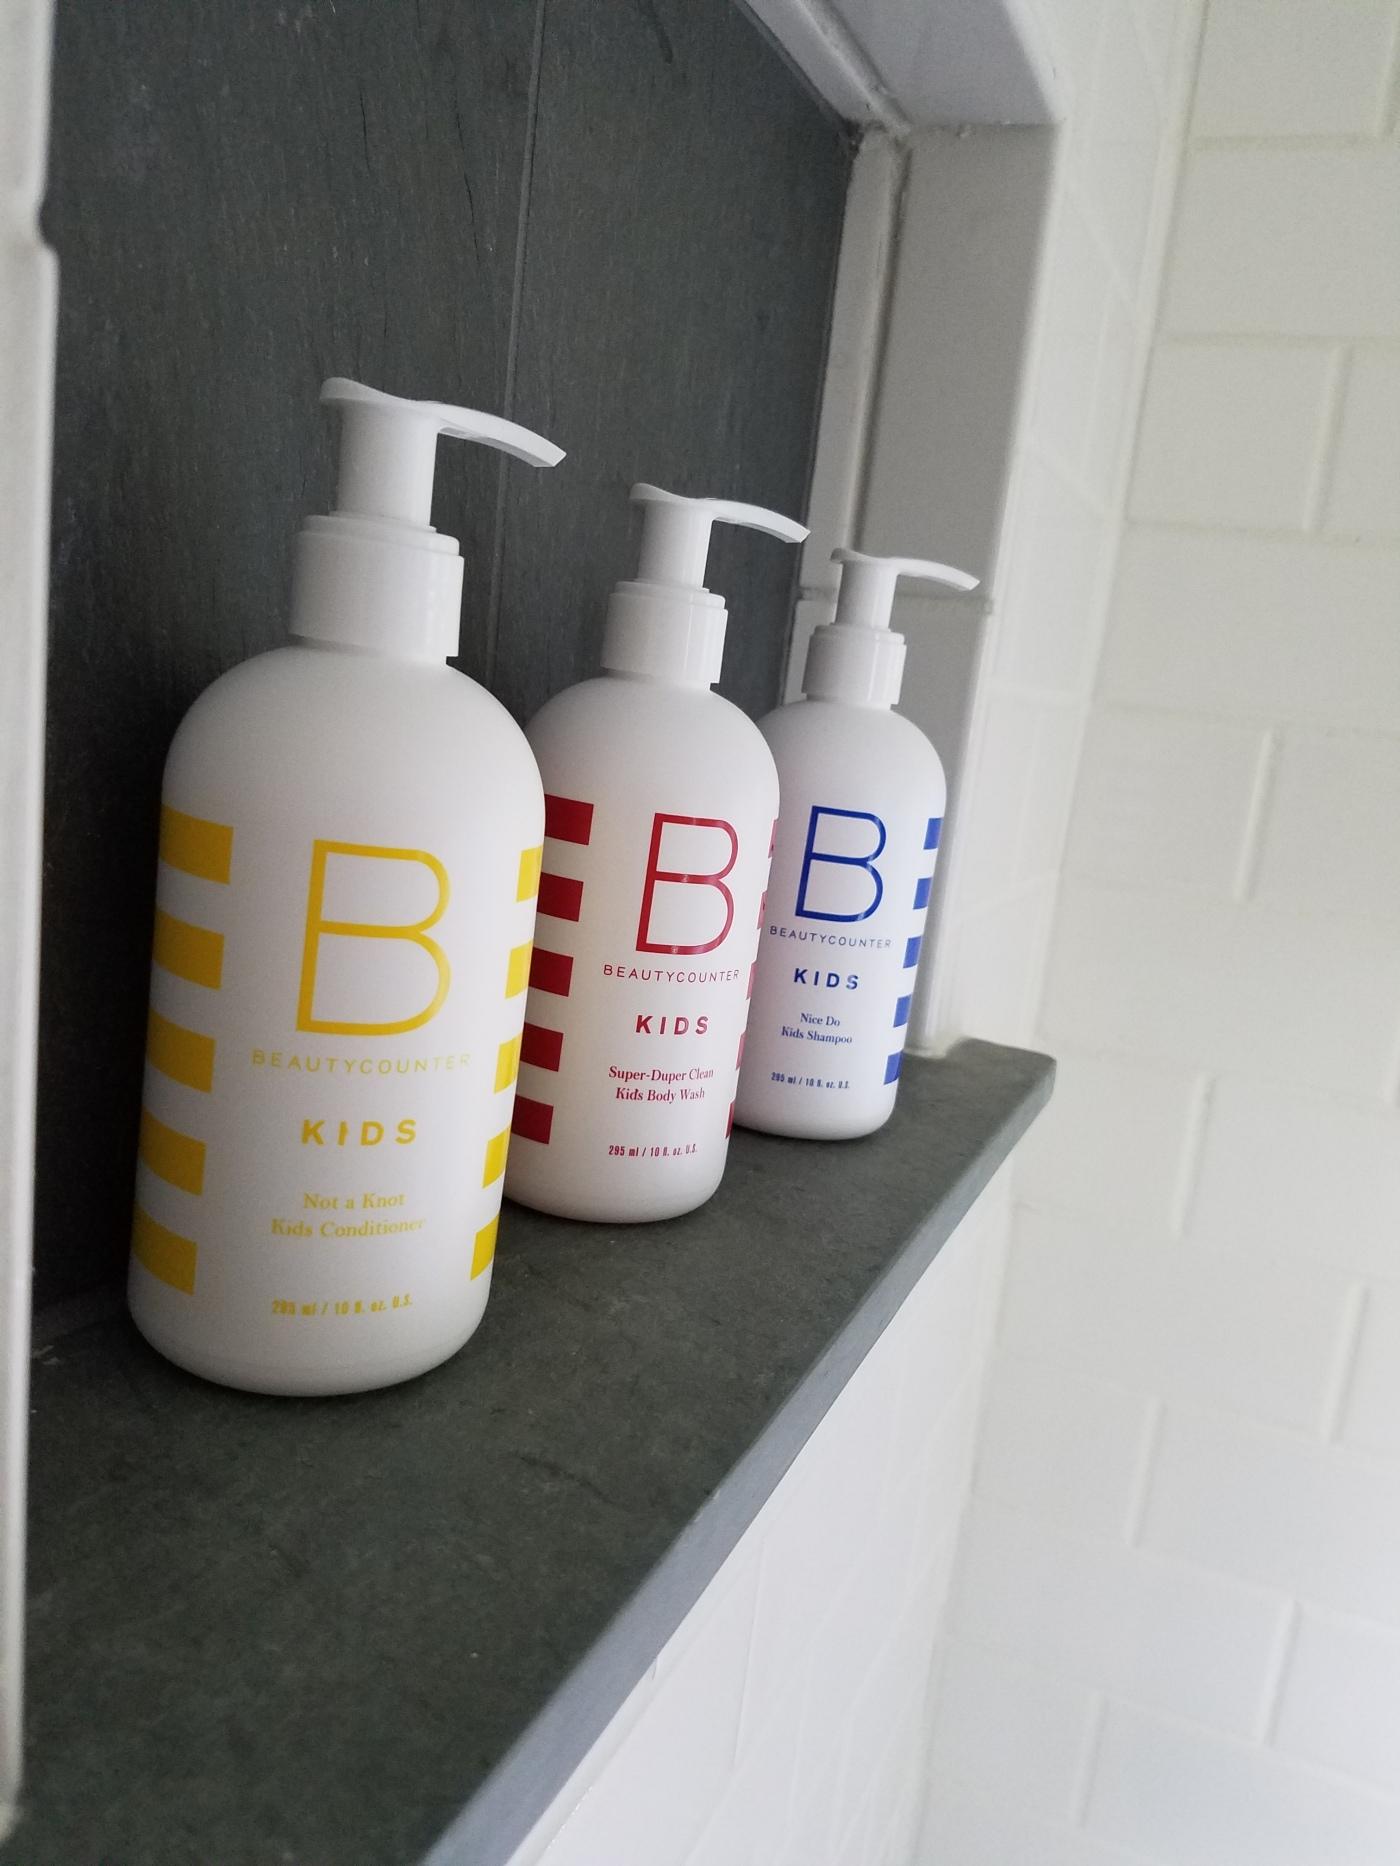 Better Beauty Vermont Beautycounter Kid's Counter on shower shelf